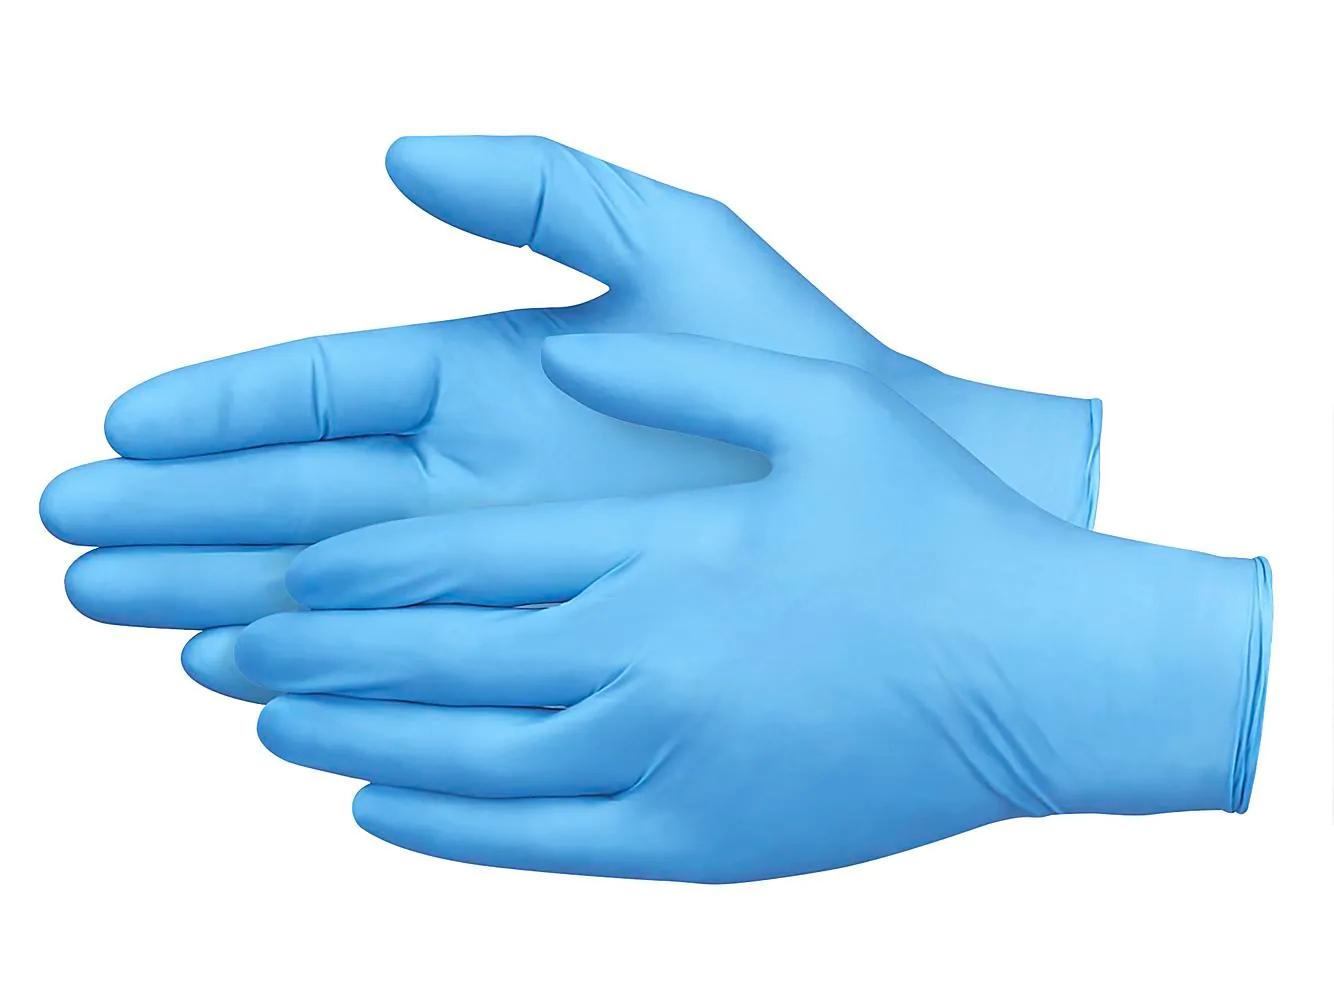 Medium Non-Medical Nitrile Gloves - Blue - Pack of 100